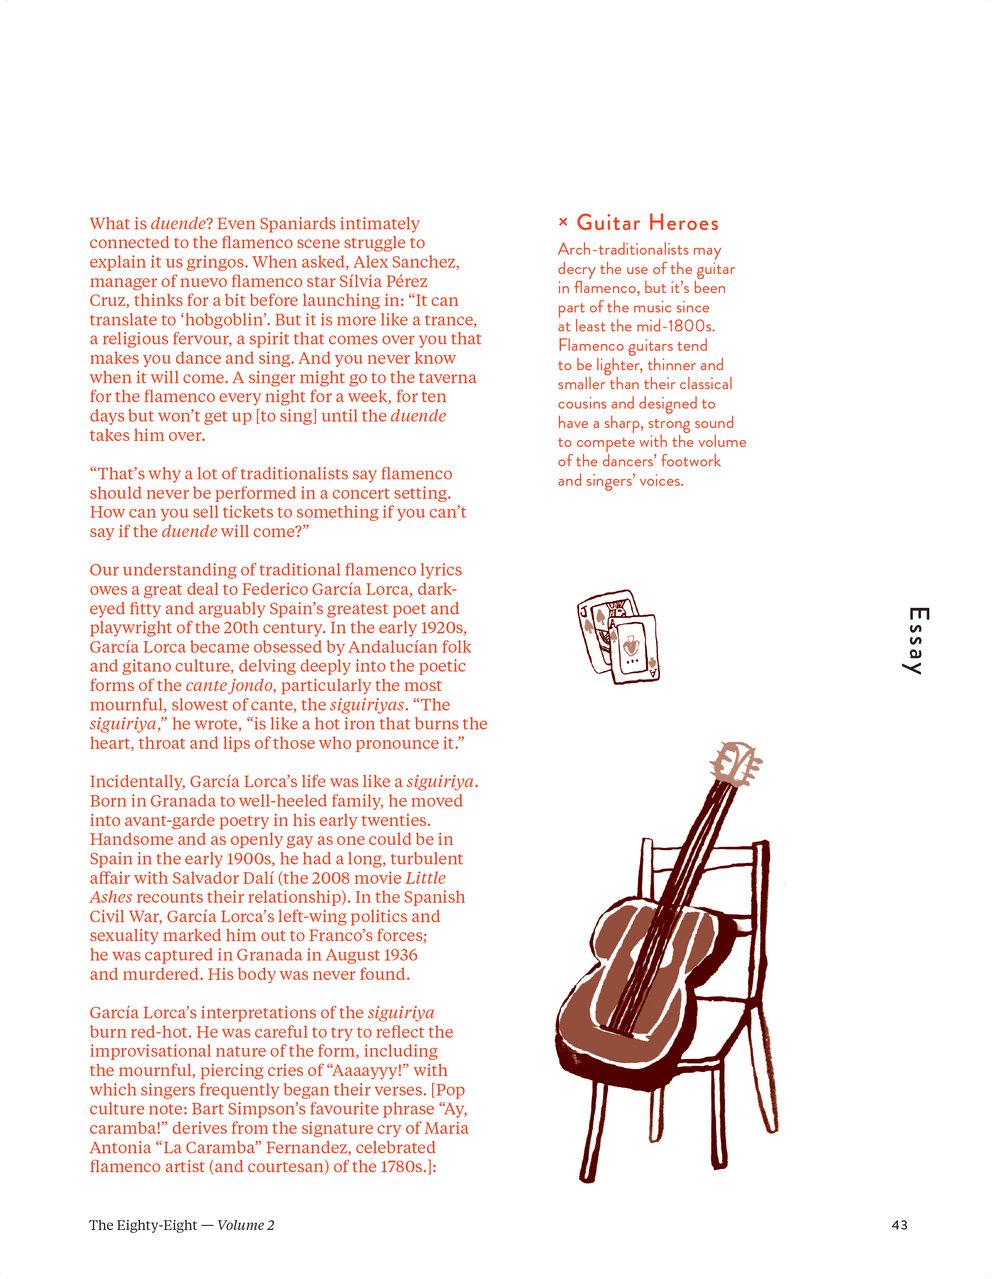 43_the88_flamenco copy.jpg